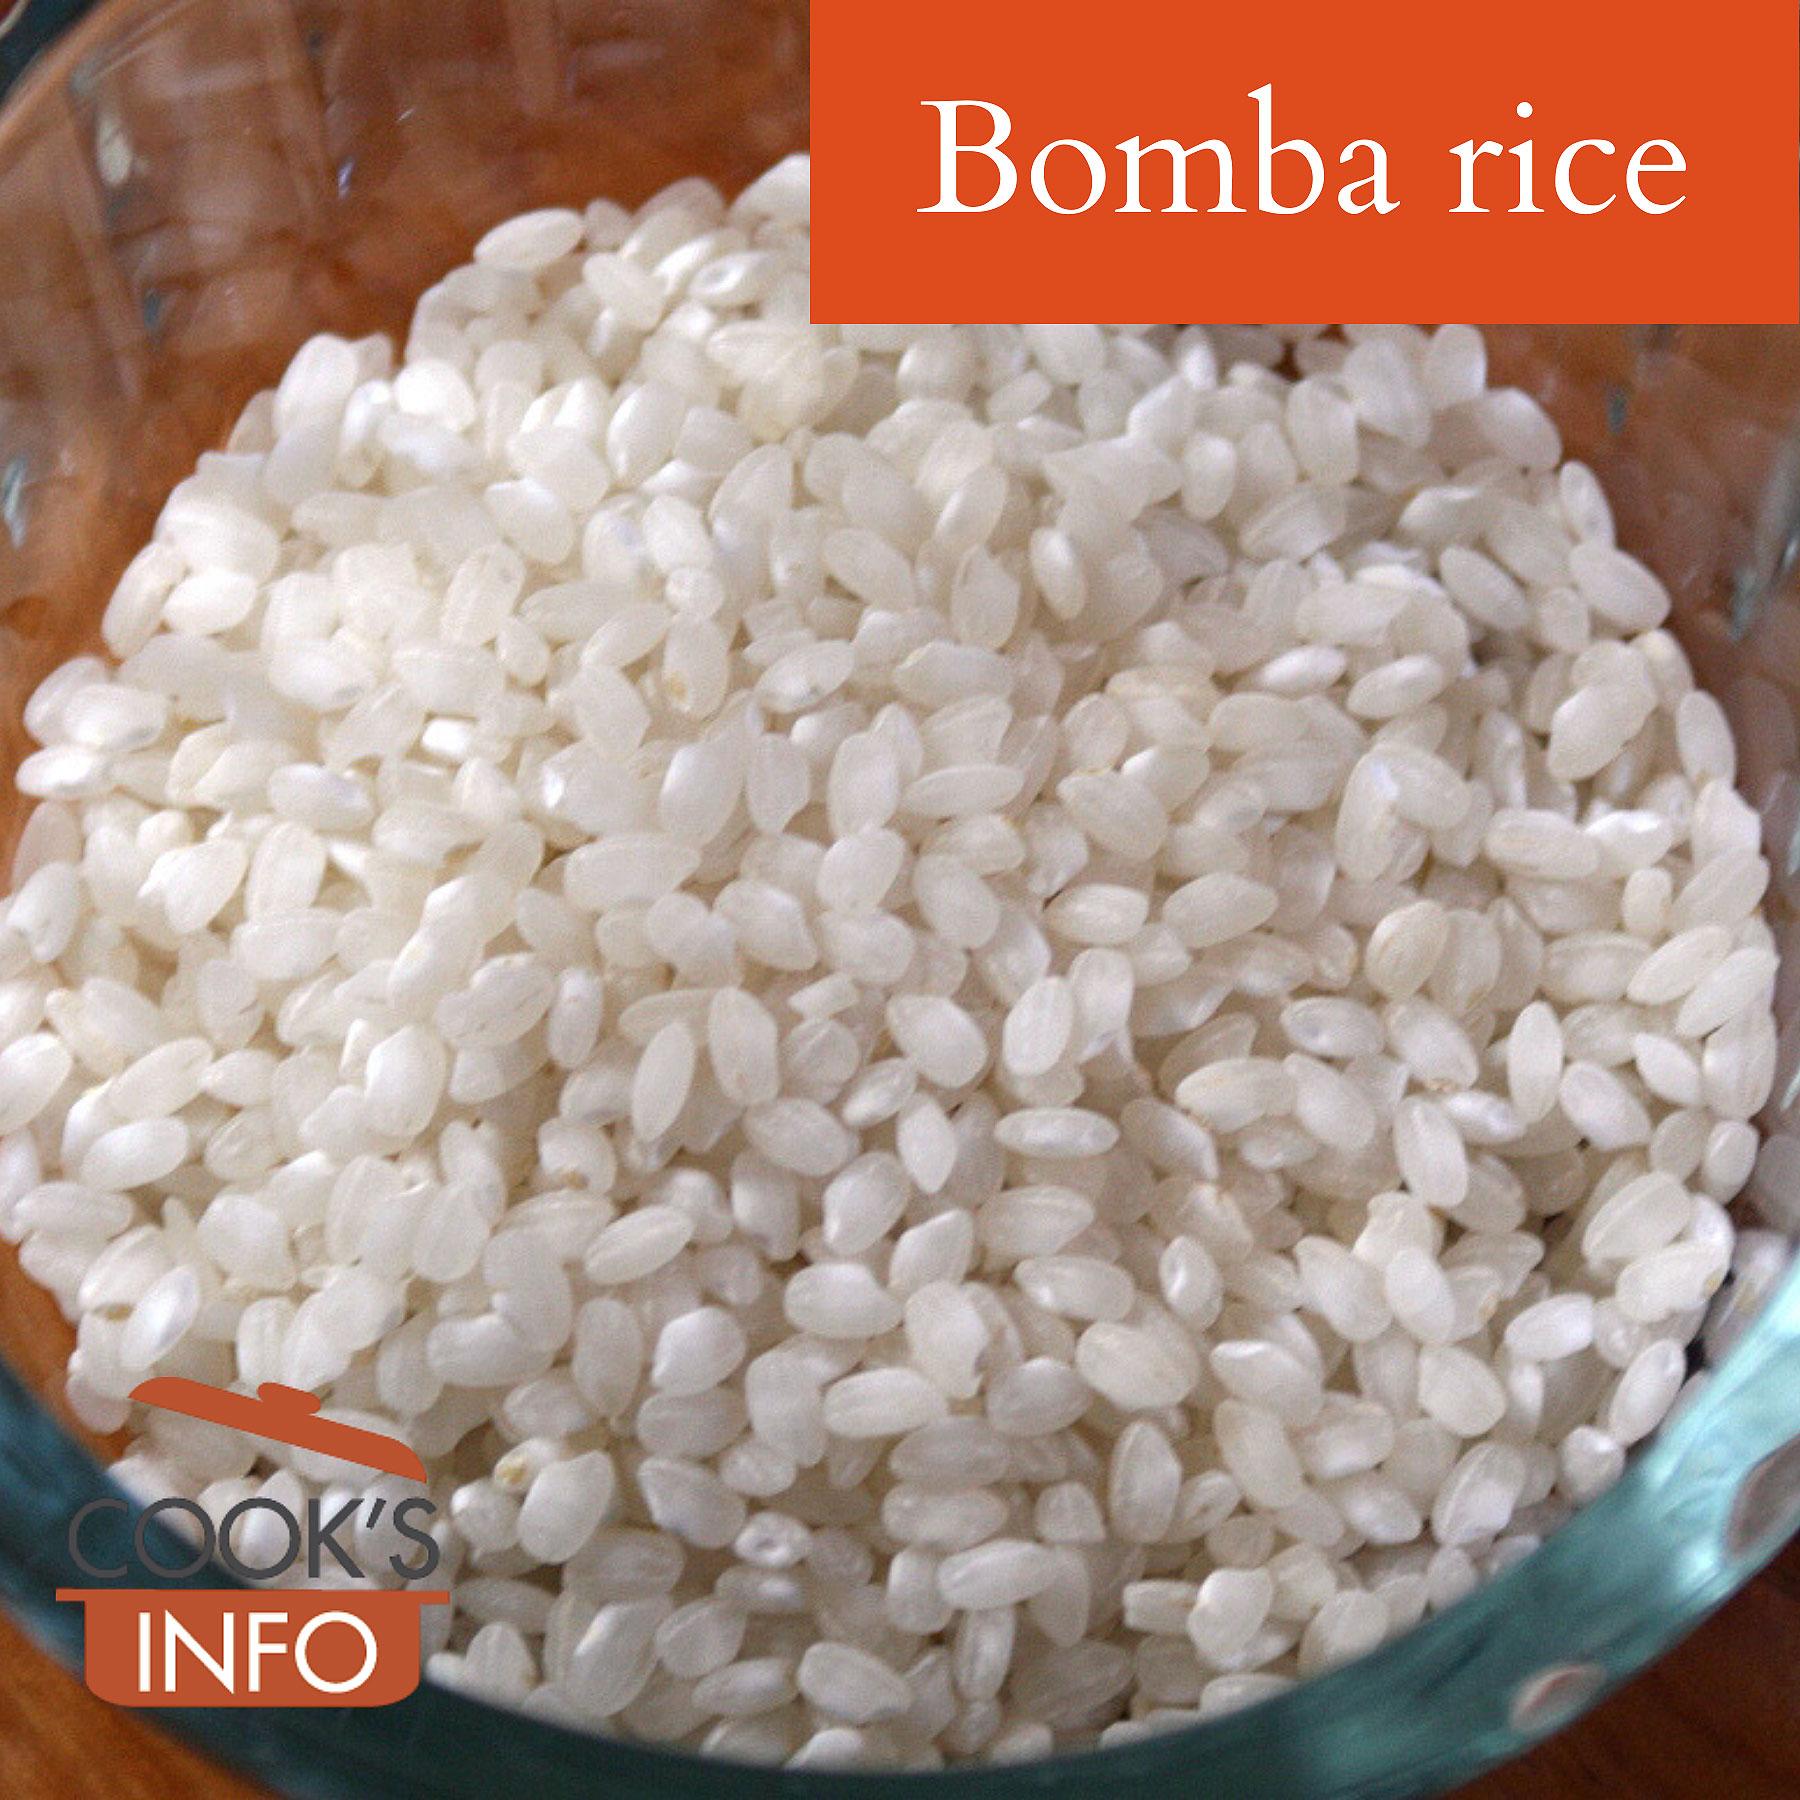 Bomba rice, dried